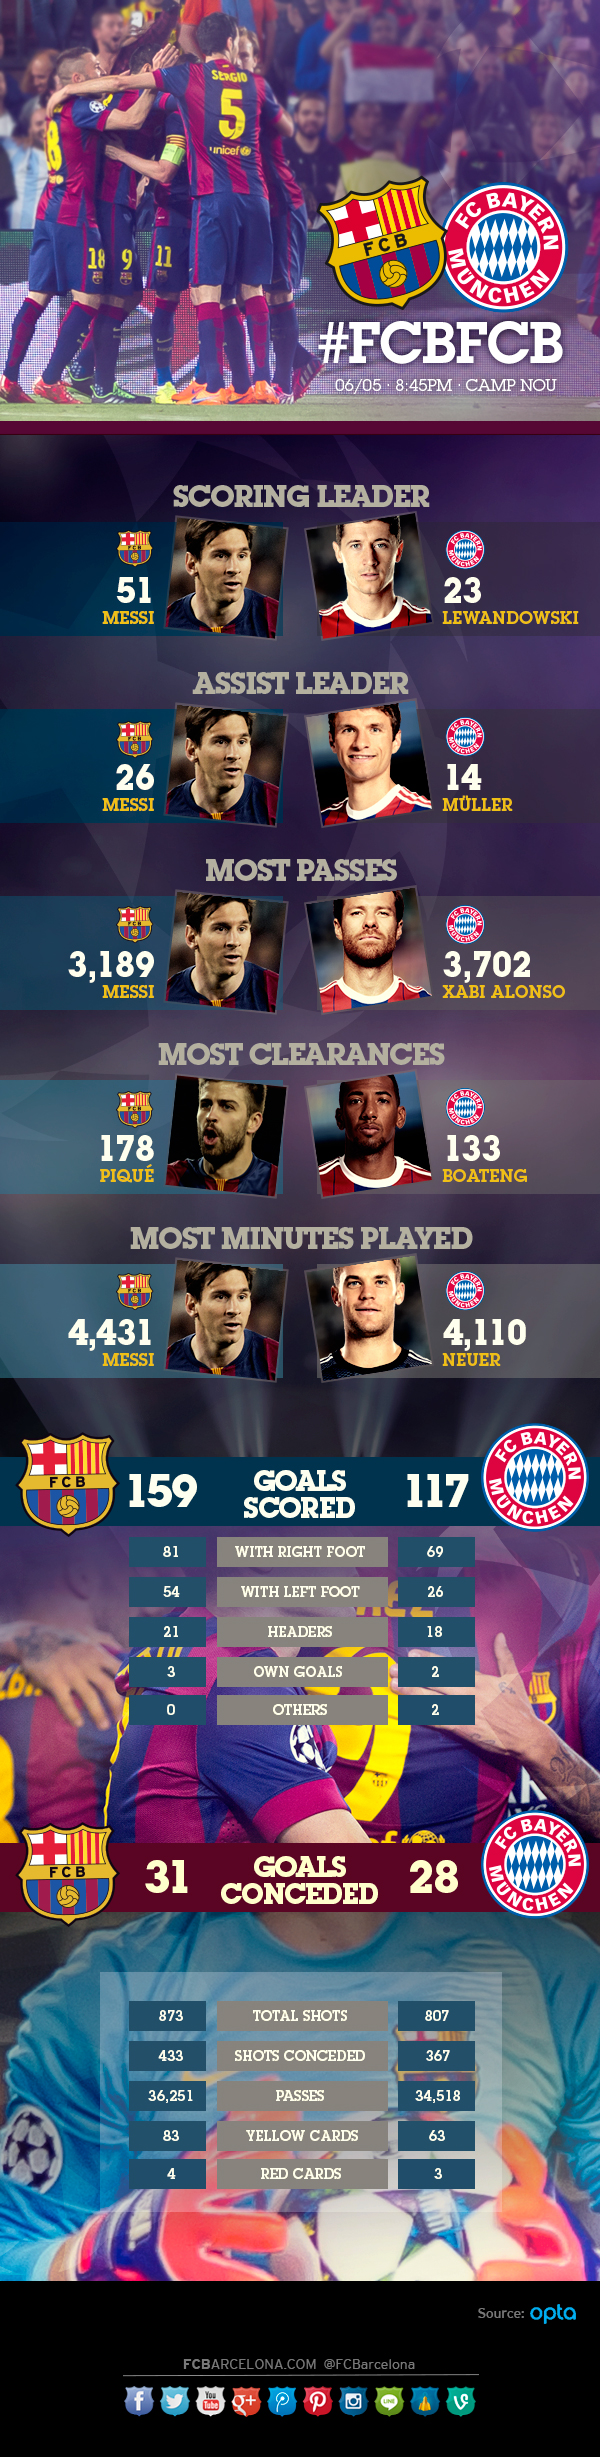 FC Barcelona v Bayern Munich [Infographic]